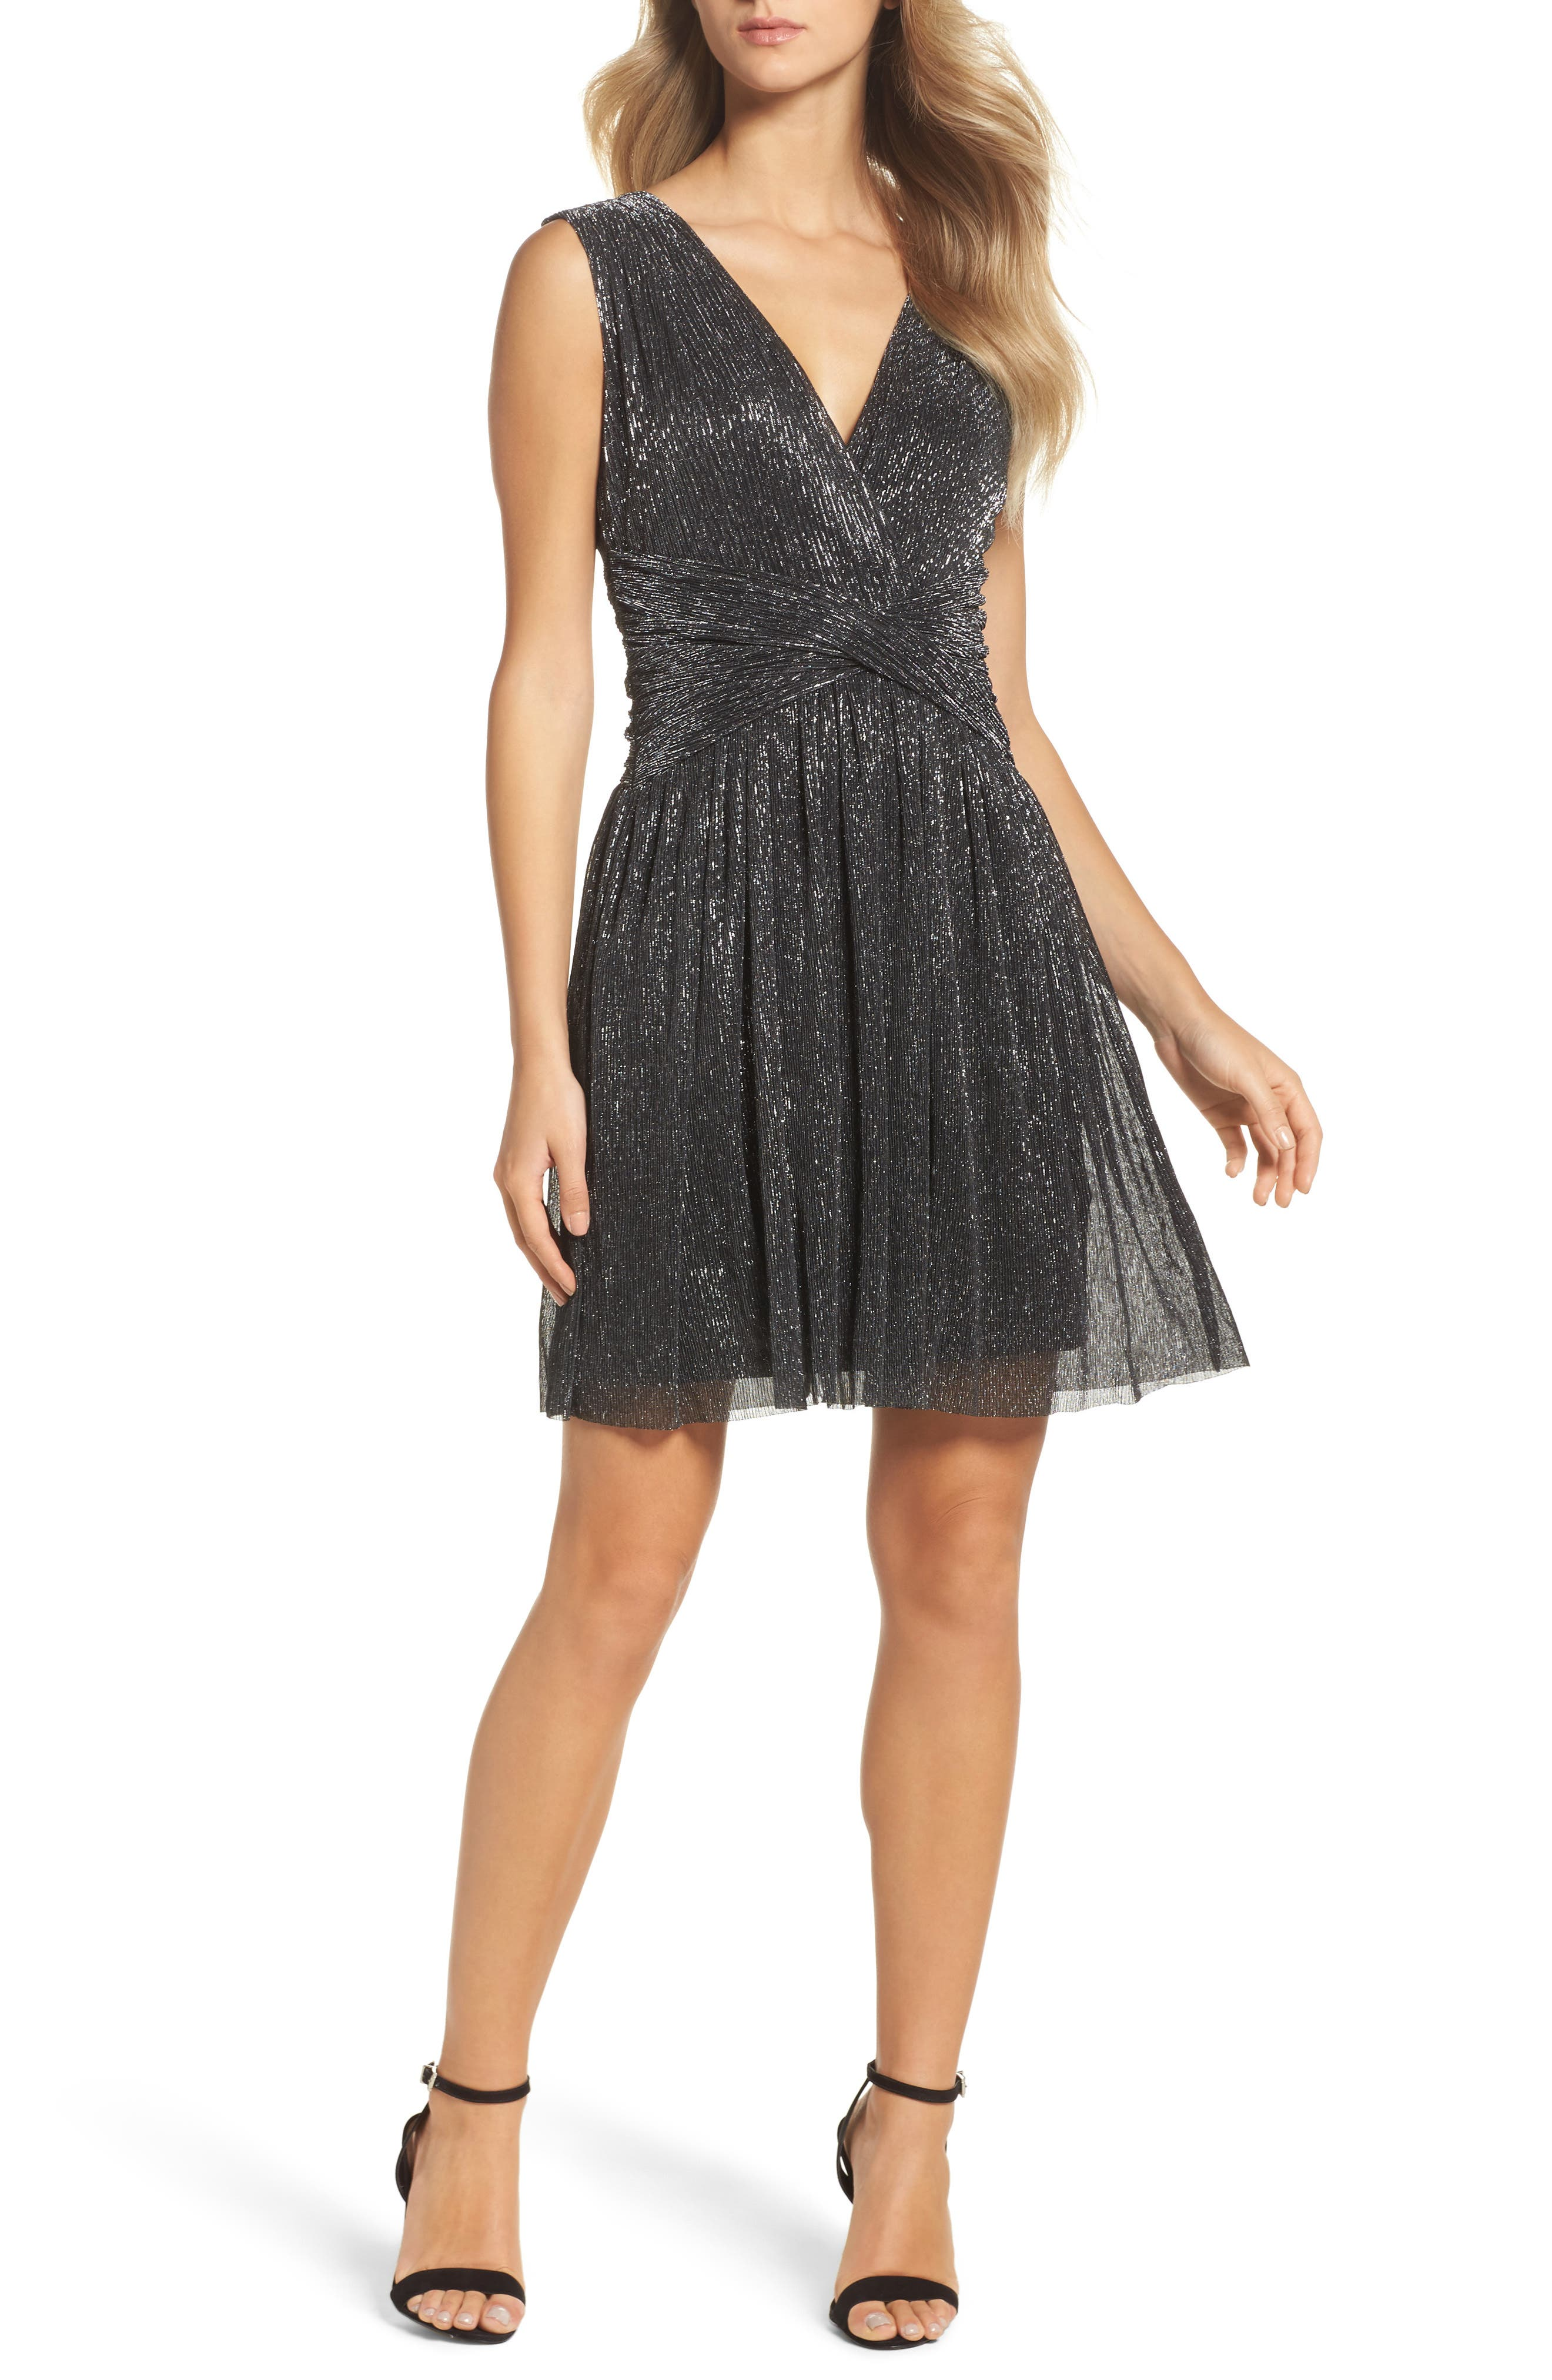 Marcelle Fit & Flare Dress,                             Main thumbnail 1, color,                             001